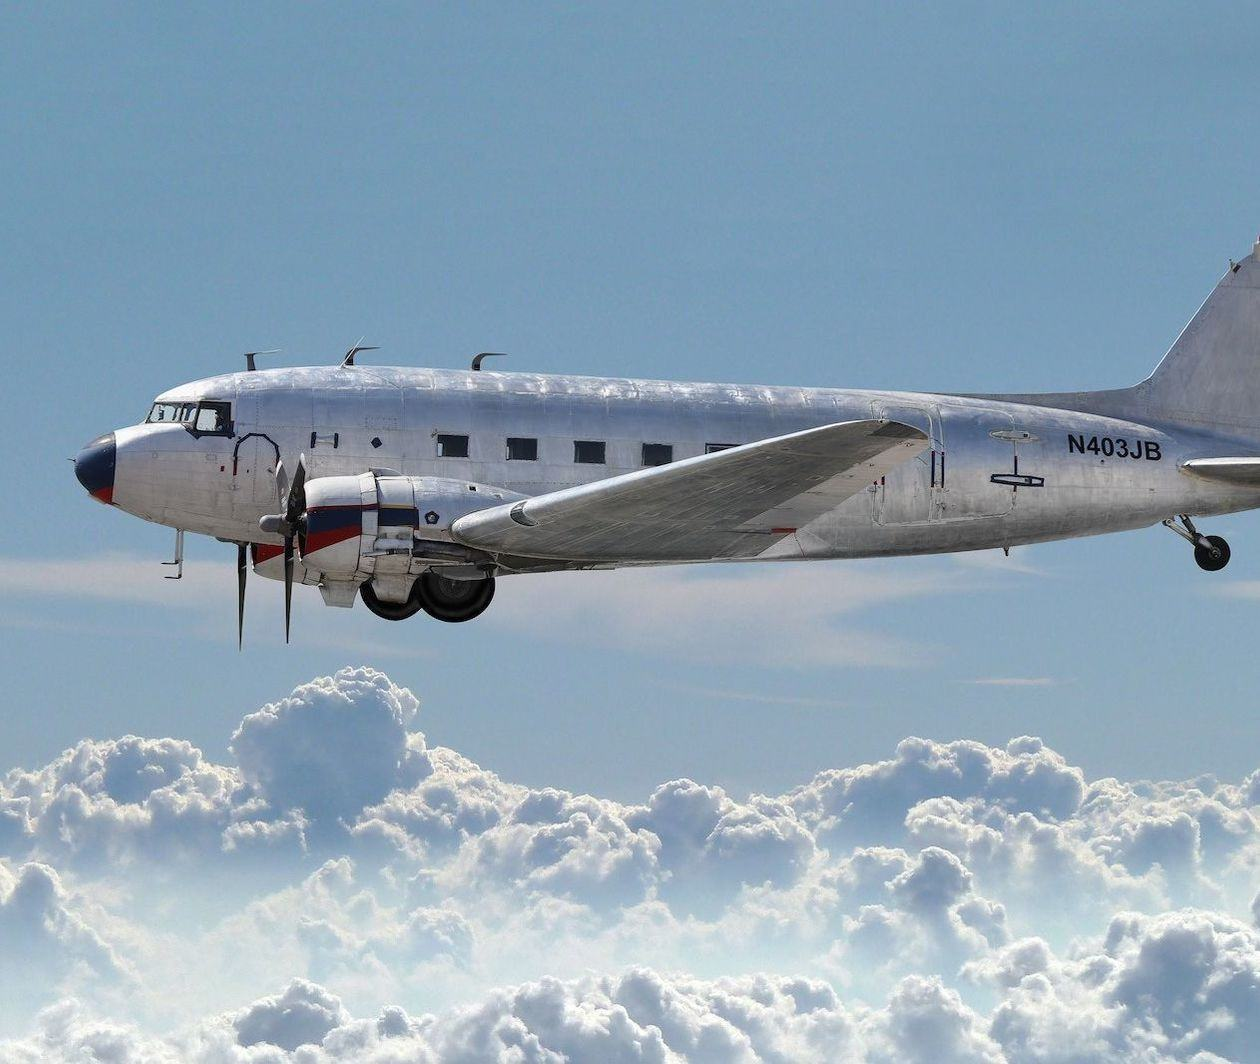 ABC of Flight Mechanics: How Do Planes Fly?